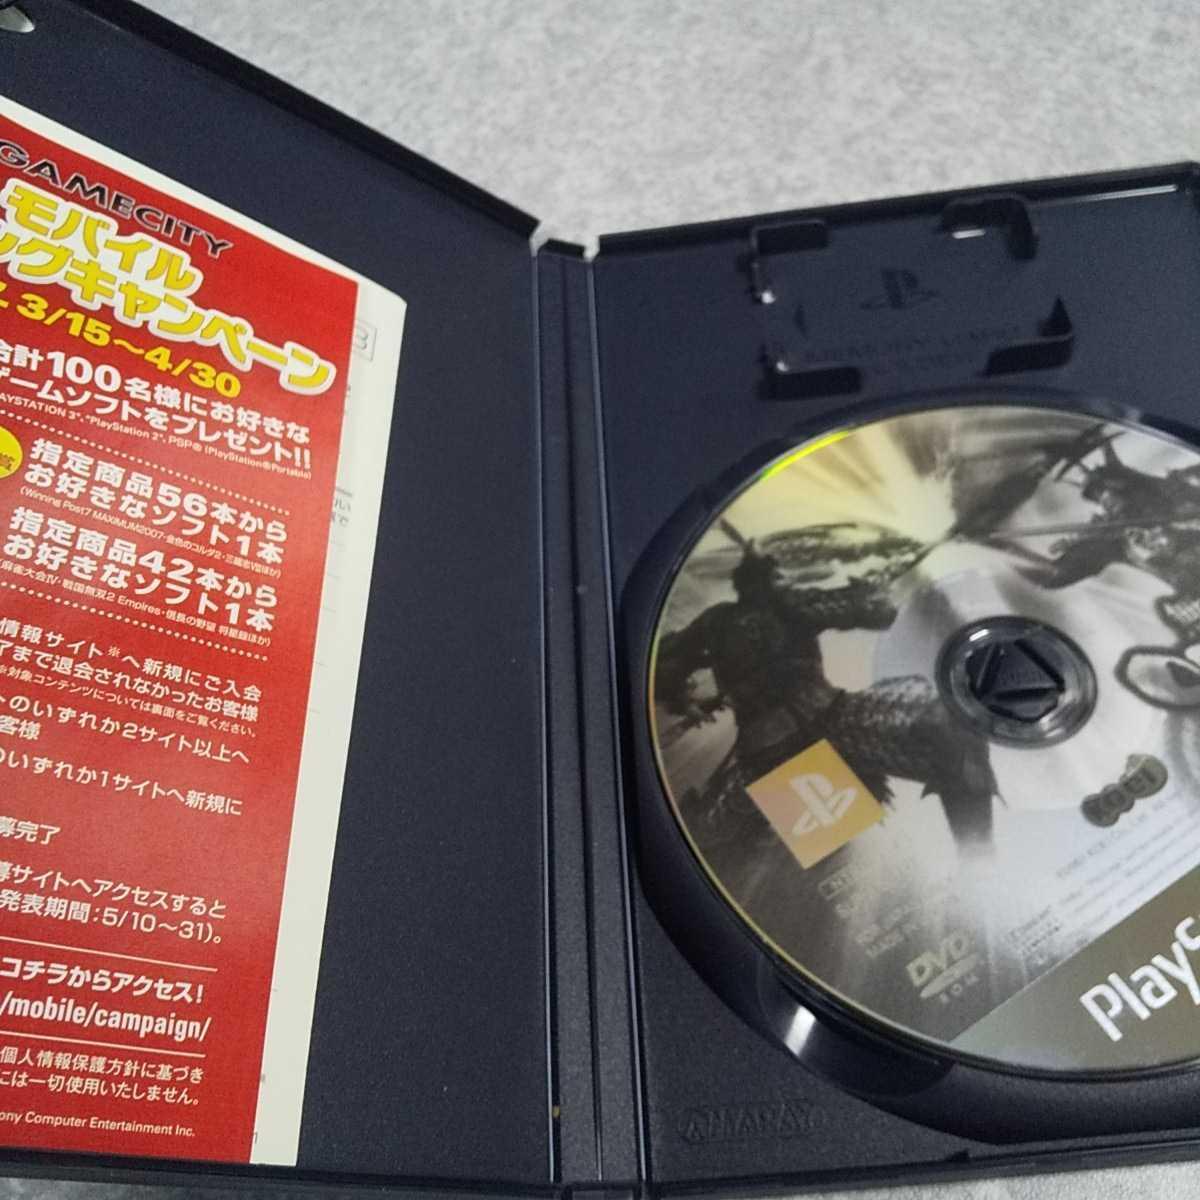 PS2【無双OROCHI】光栄 説明書なし [送料無料]返金保証あり